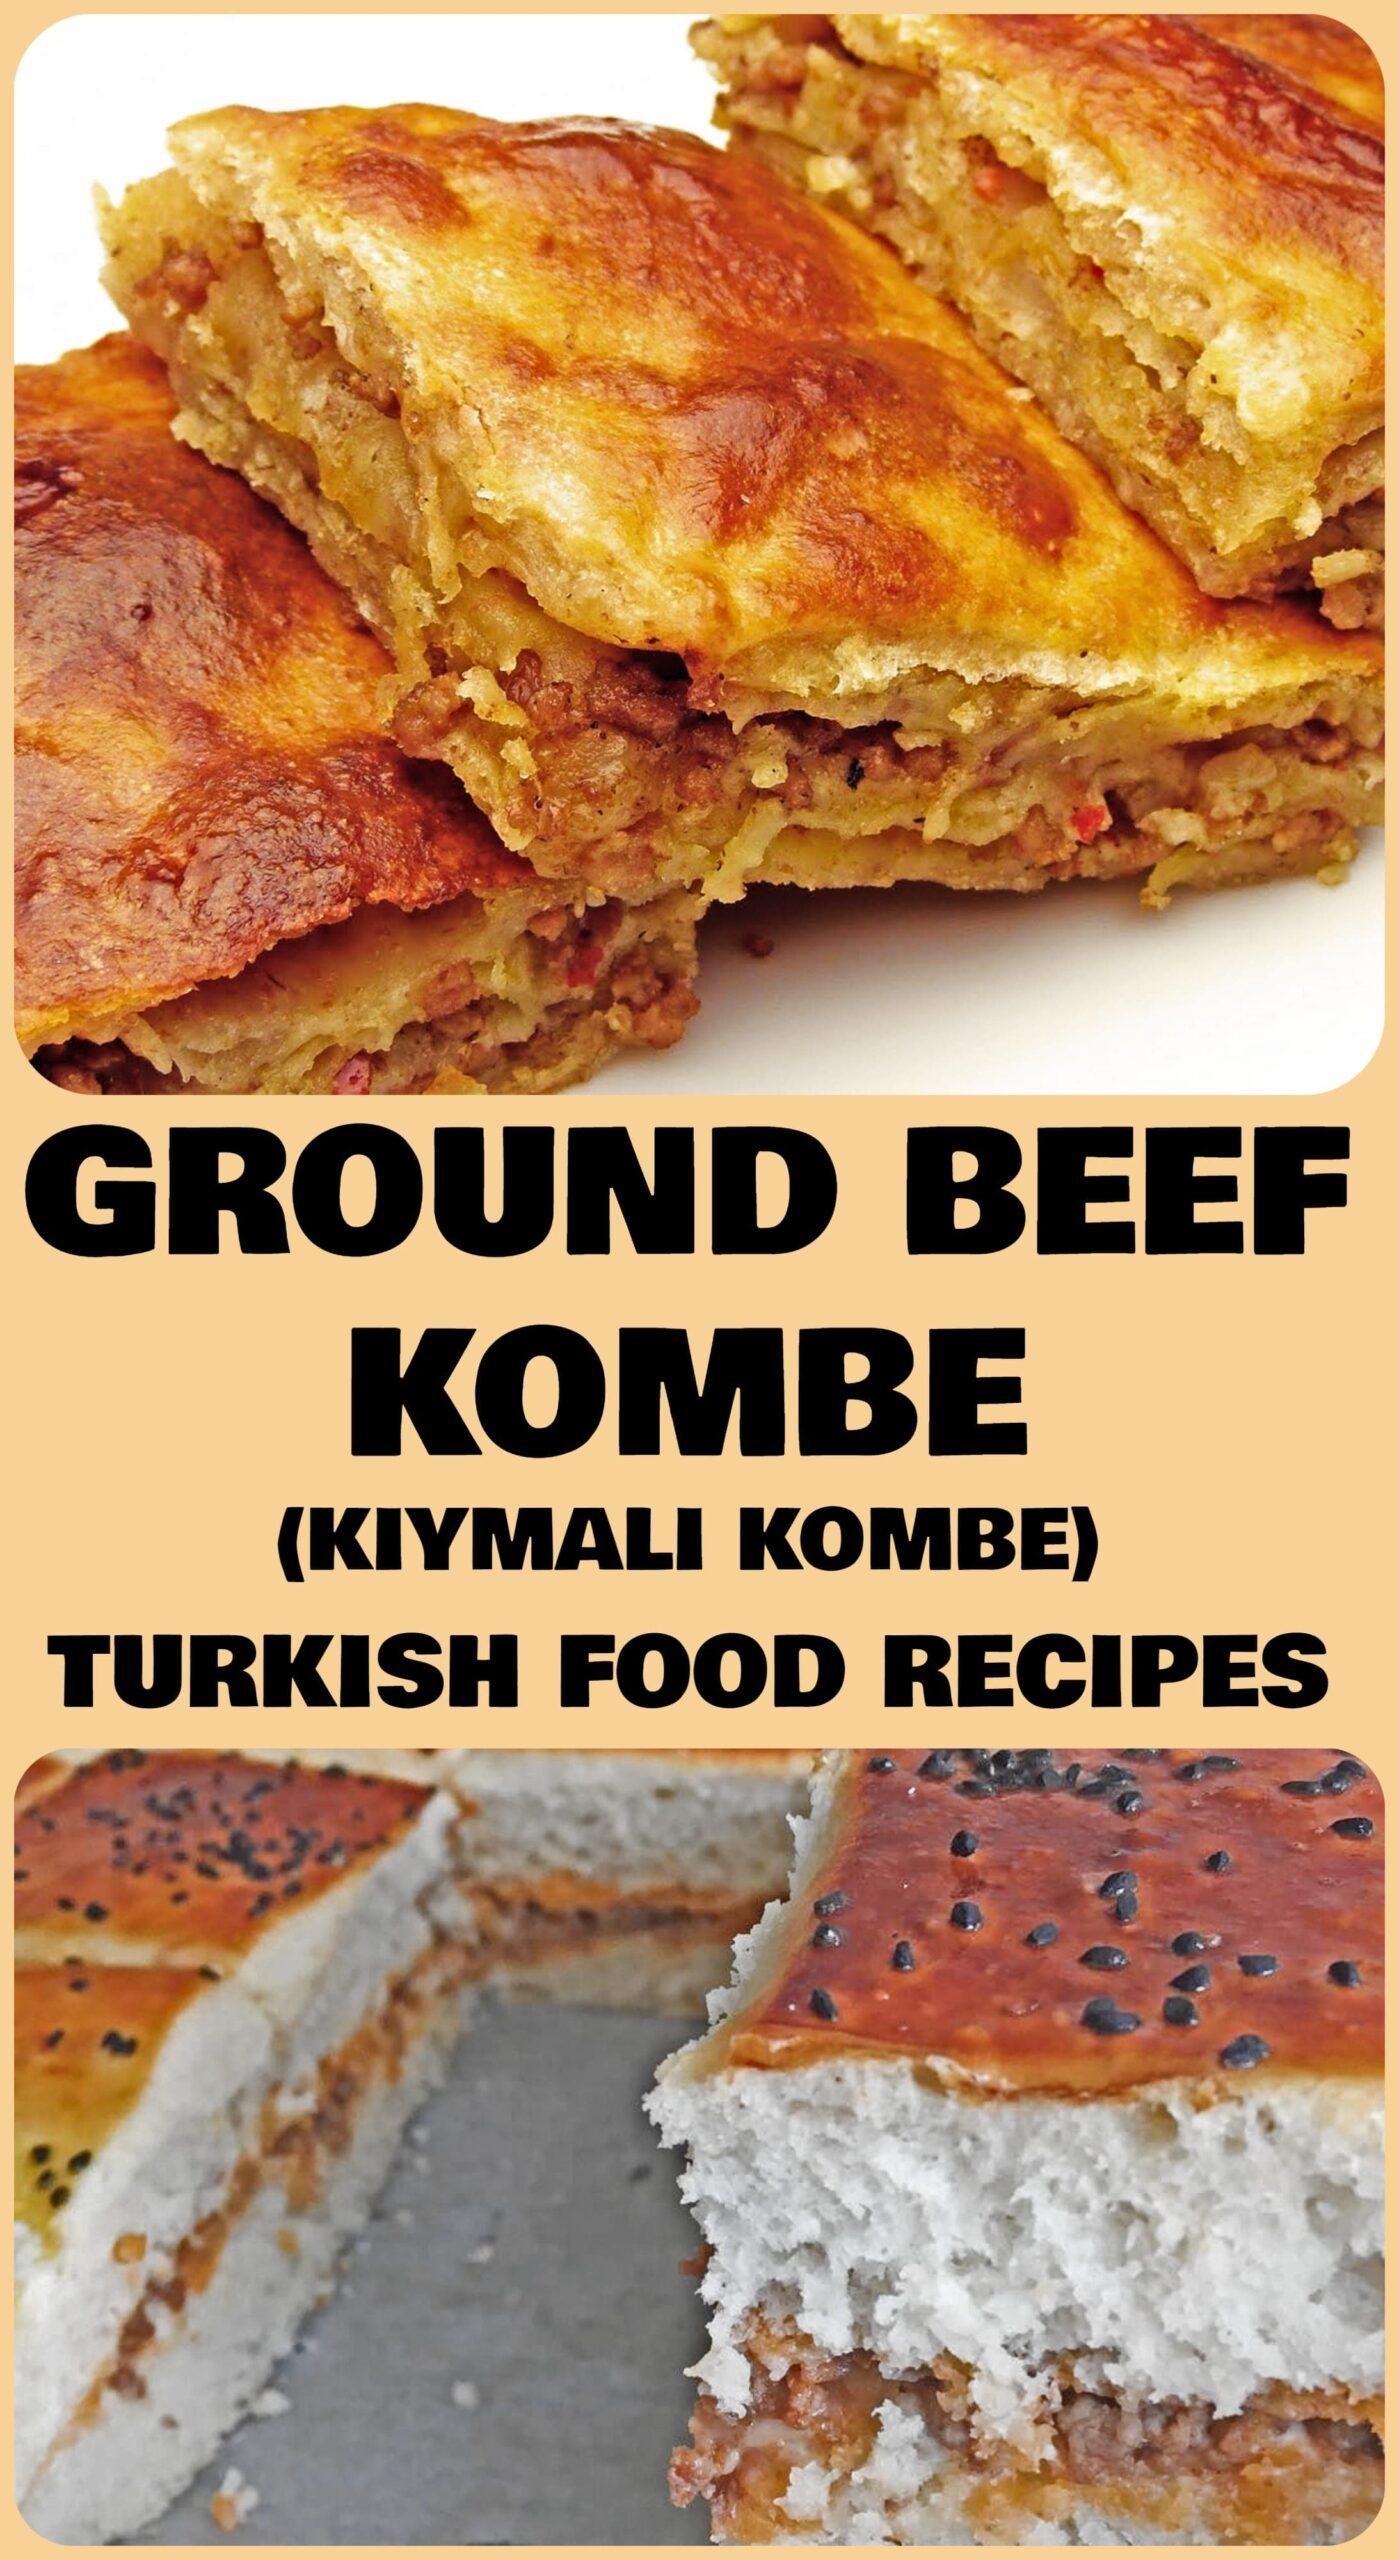 Ground Beef Kombe - Kiymali Kombe Recipe